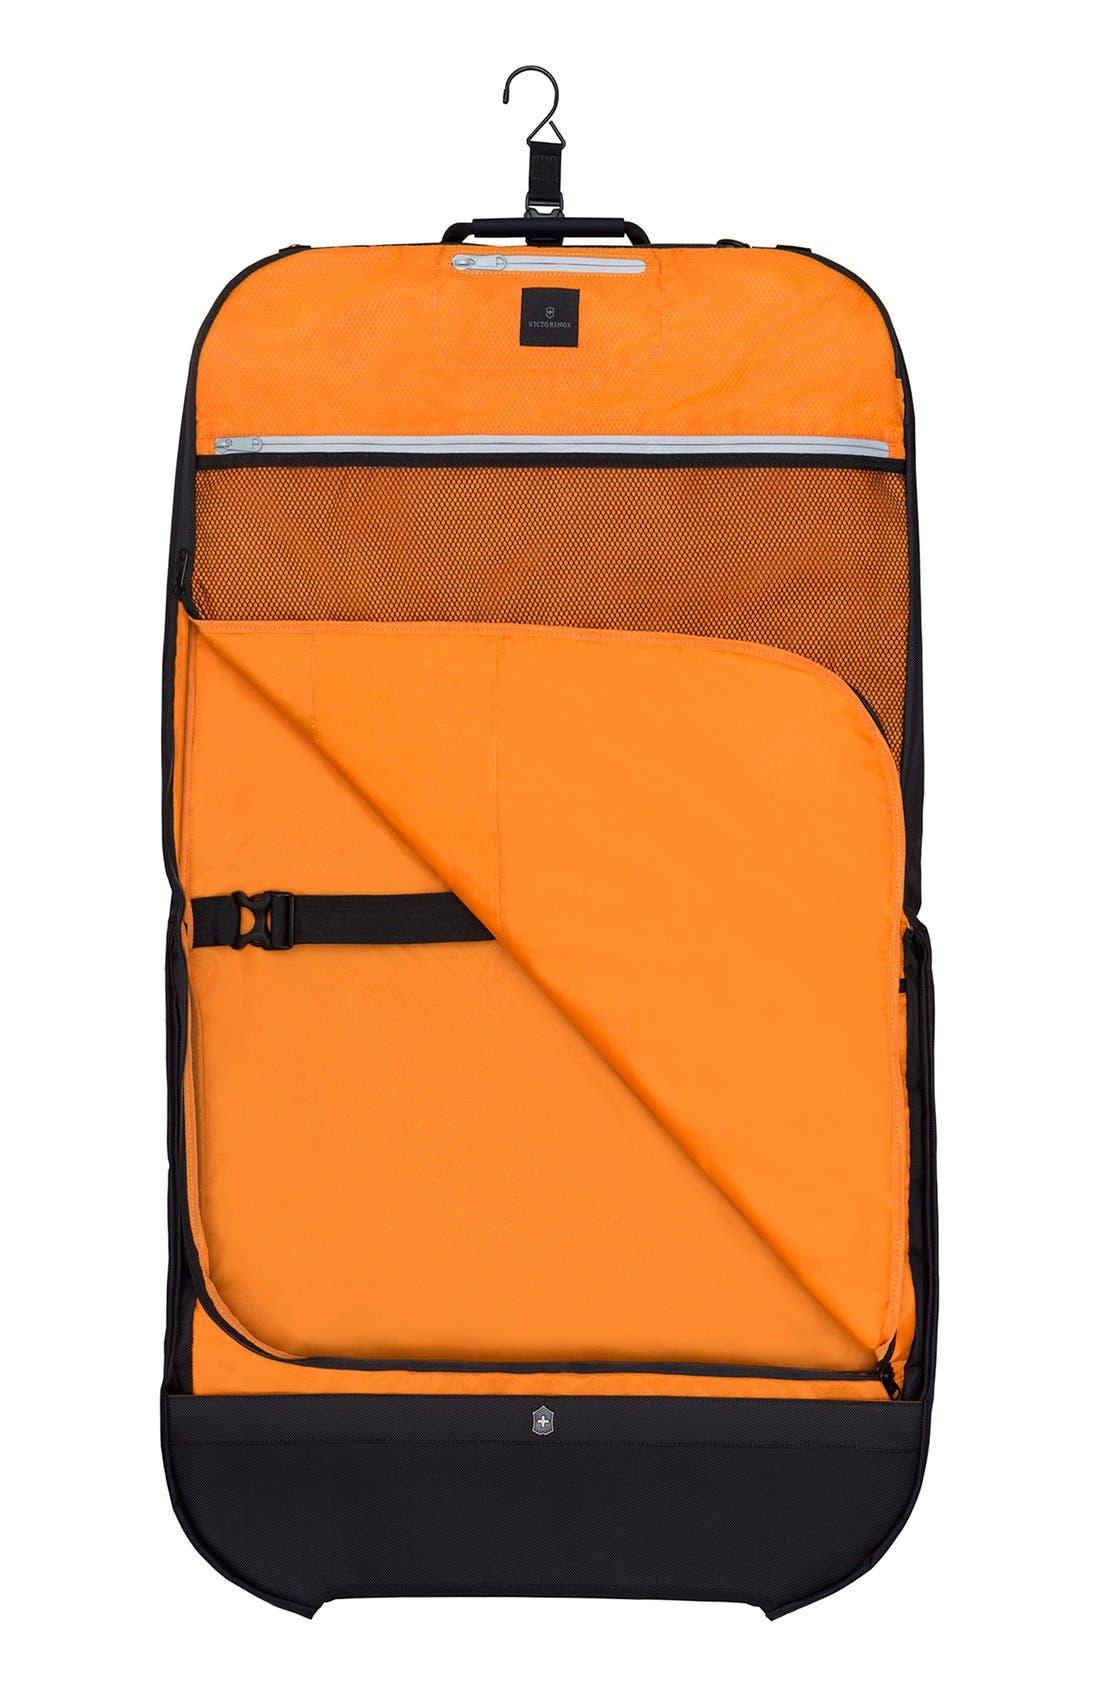 Alternate Image 2  - Victorinox Swiss Army® WT 5.0 Deluxe Garment Bag